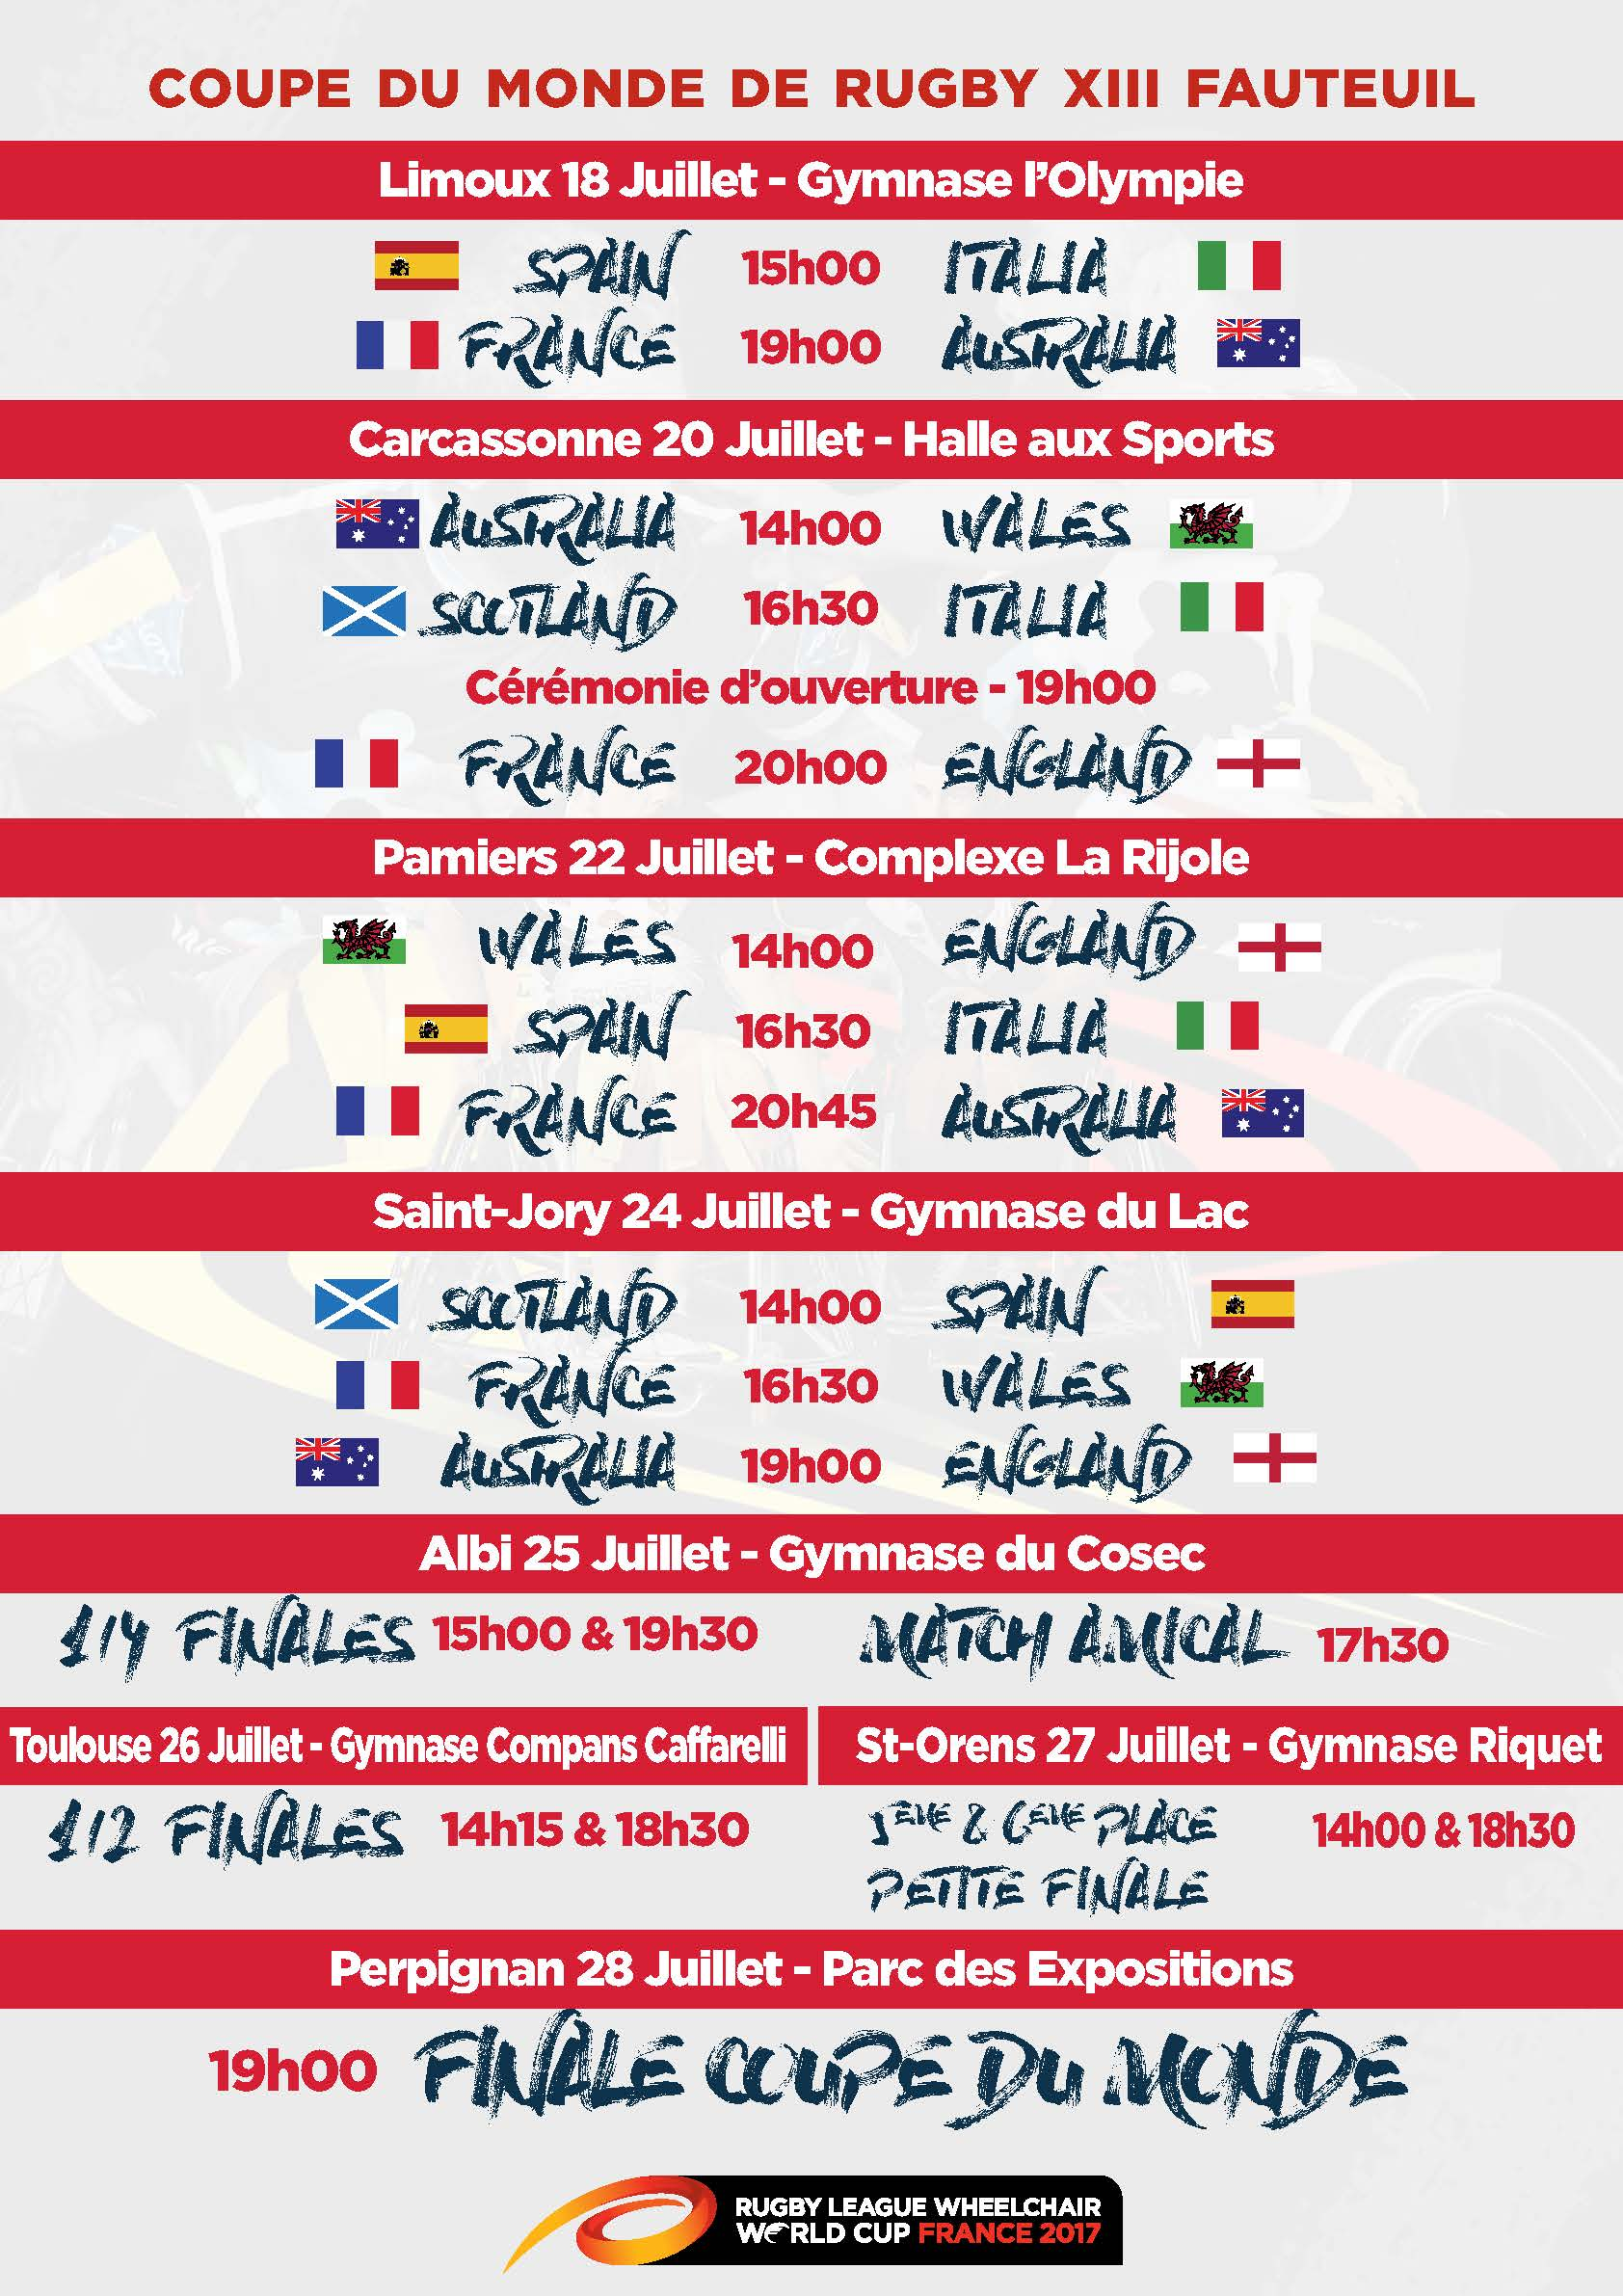 Coupe du monde rugby xiii fauteuil le programme f d ration fran aise de rugby xiii - Programme coupe de monde rugby ...